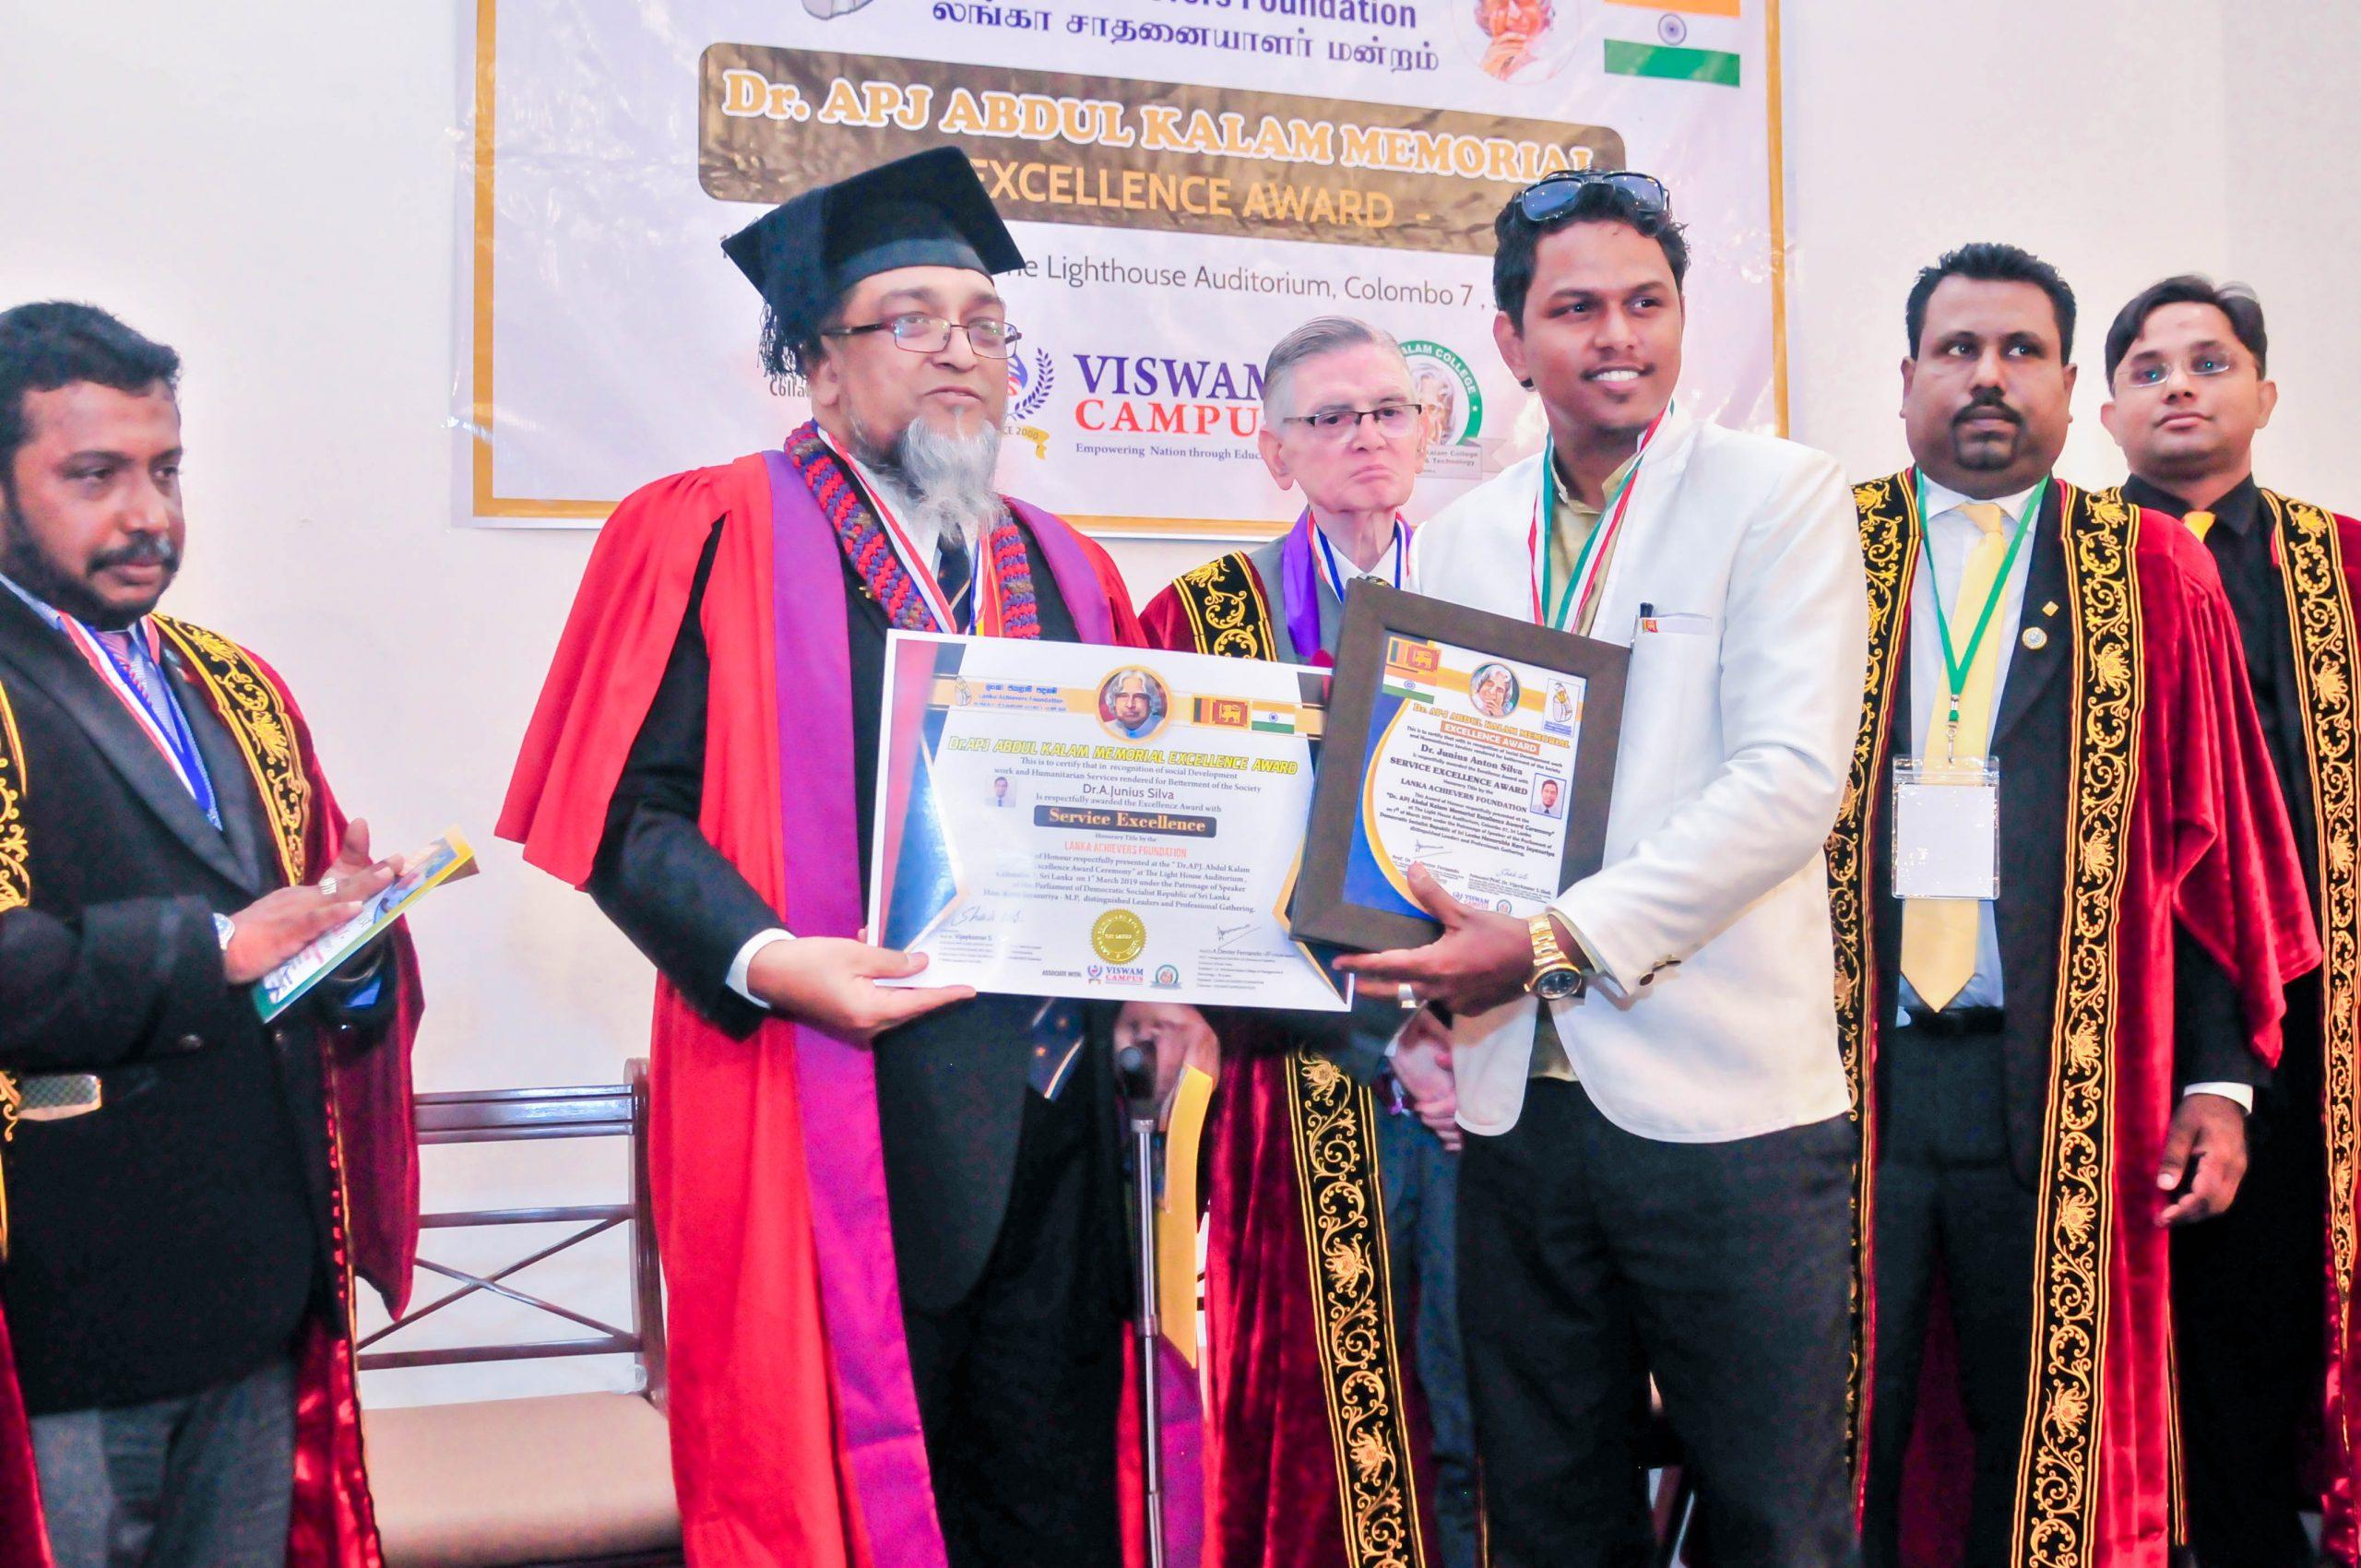 Dr. Abdul Kalam 2019 (32)